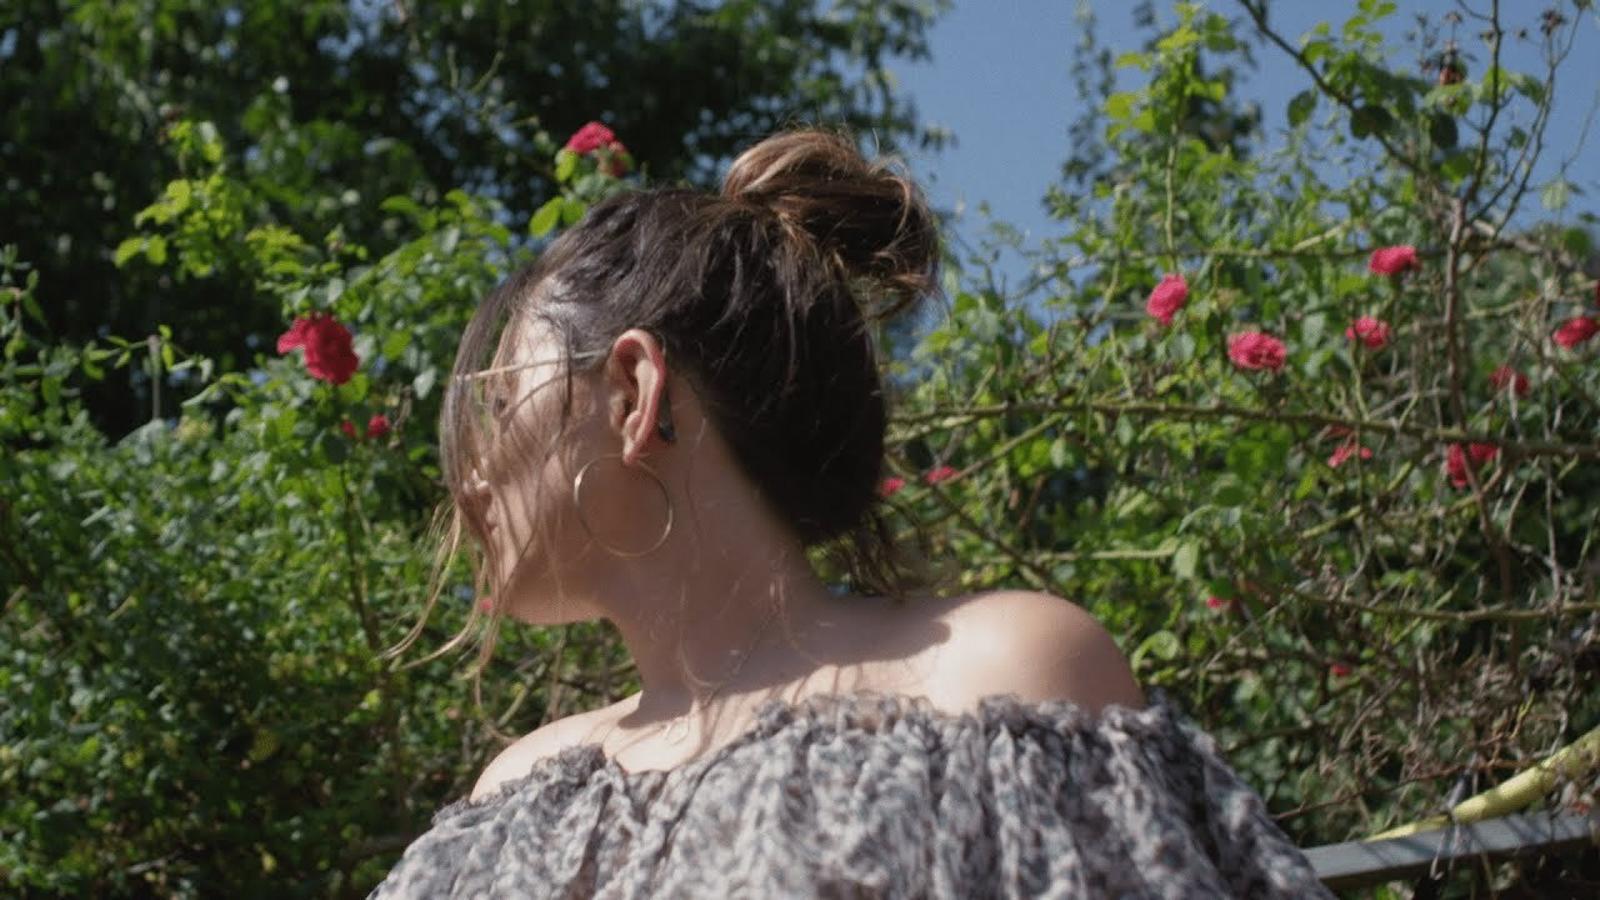 Gessamí Boada, ' Com si no fossis ningú', videoclip